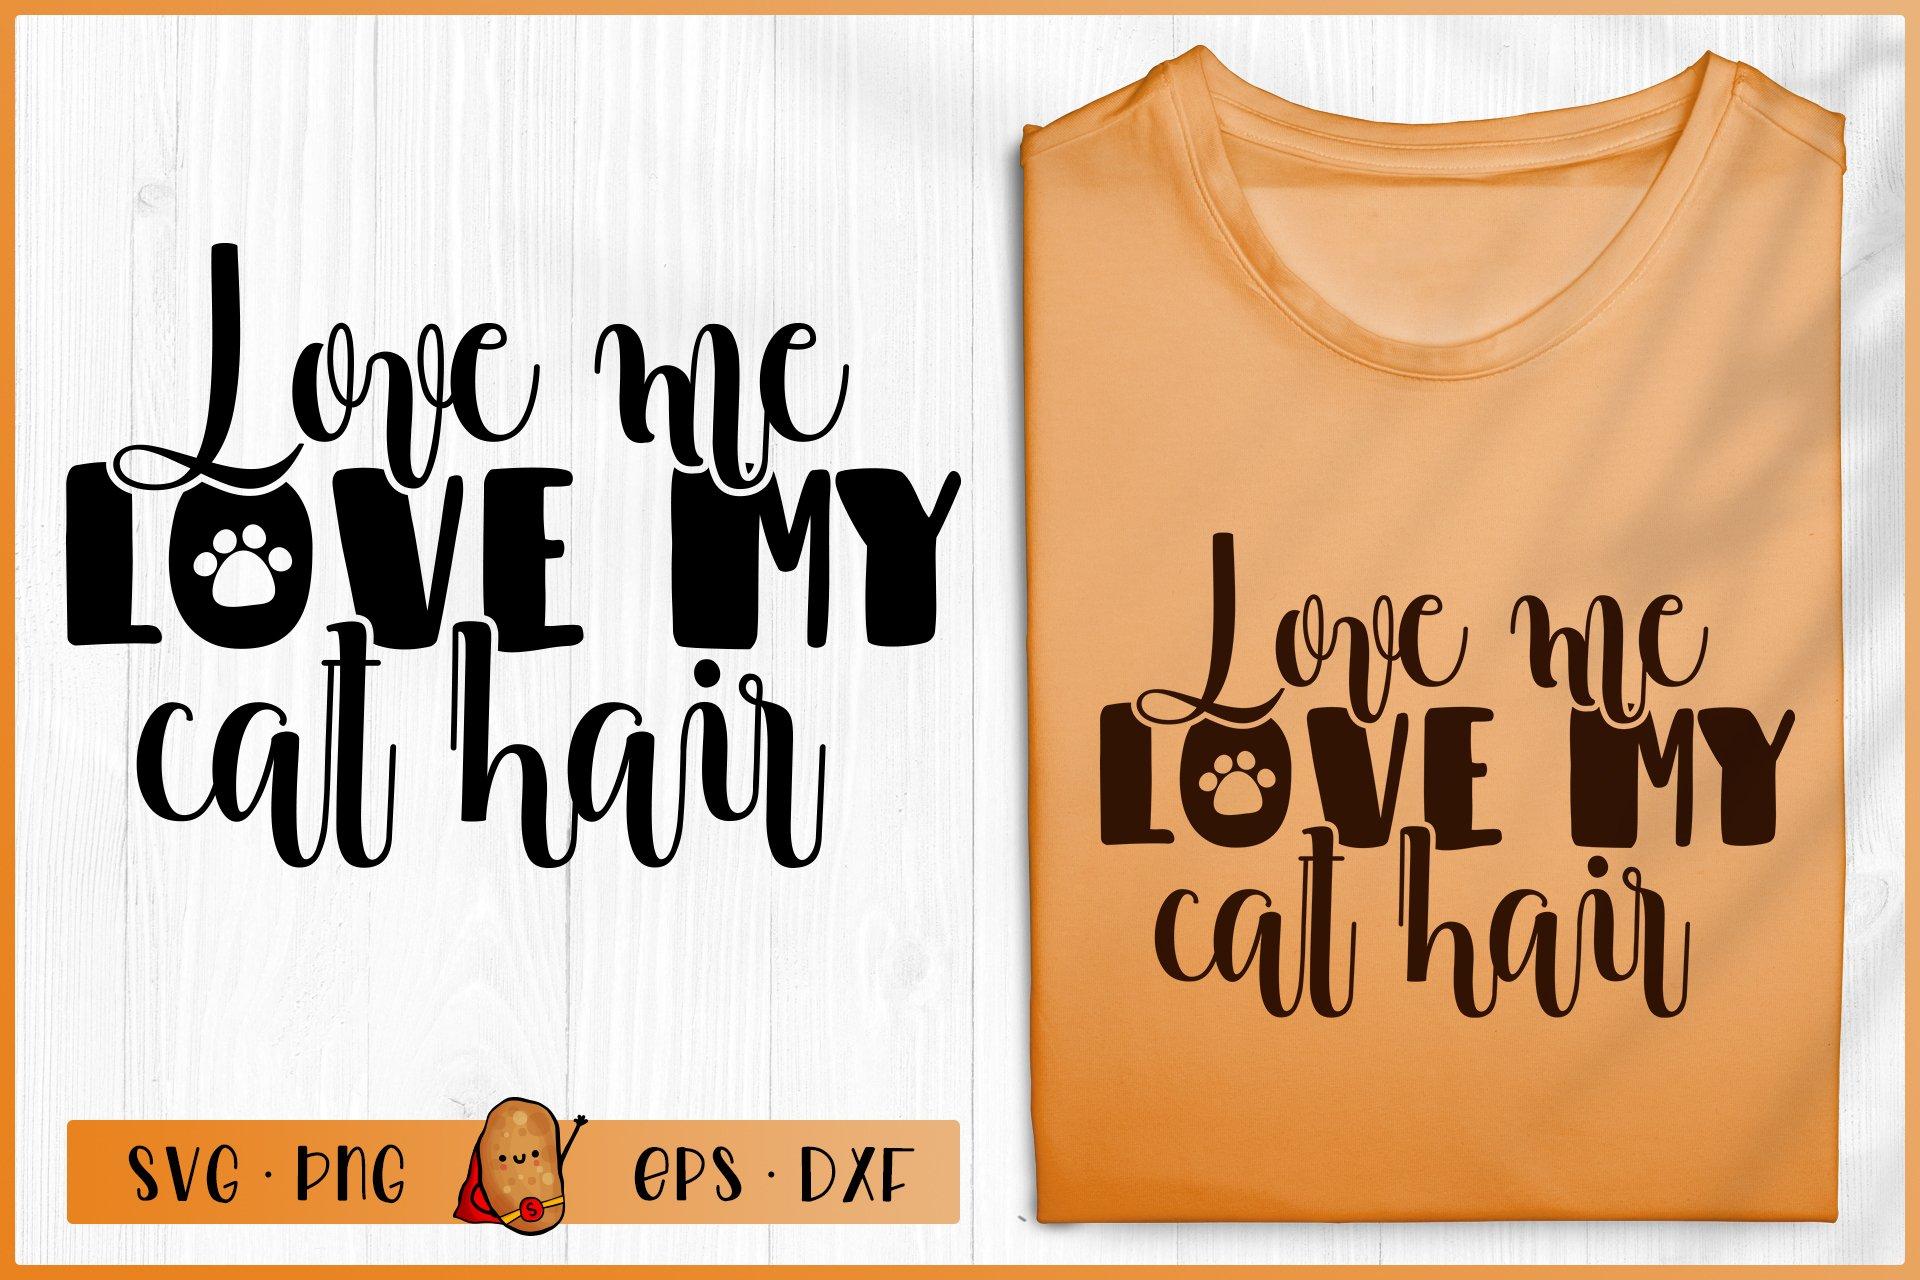 Download Love Me Love My Cat Hair Svg Cat Quotes Svg Cat Svg 572247 Cut Files Design Bundles